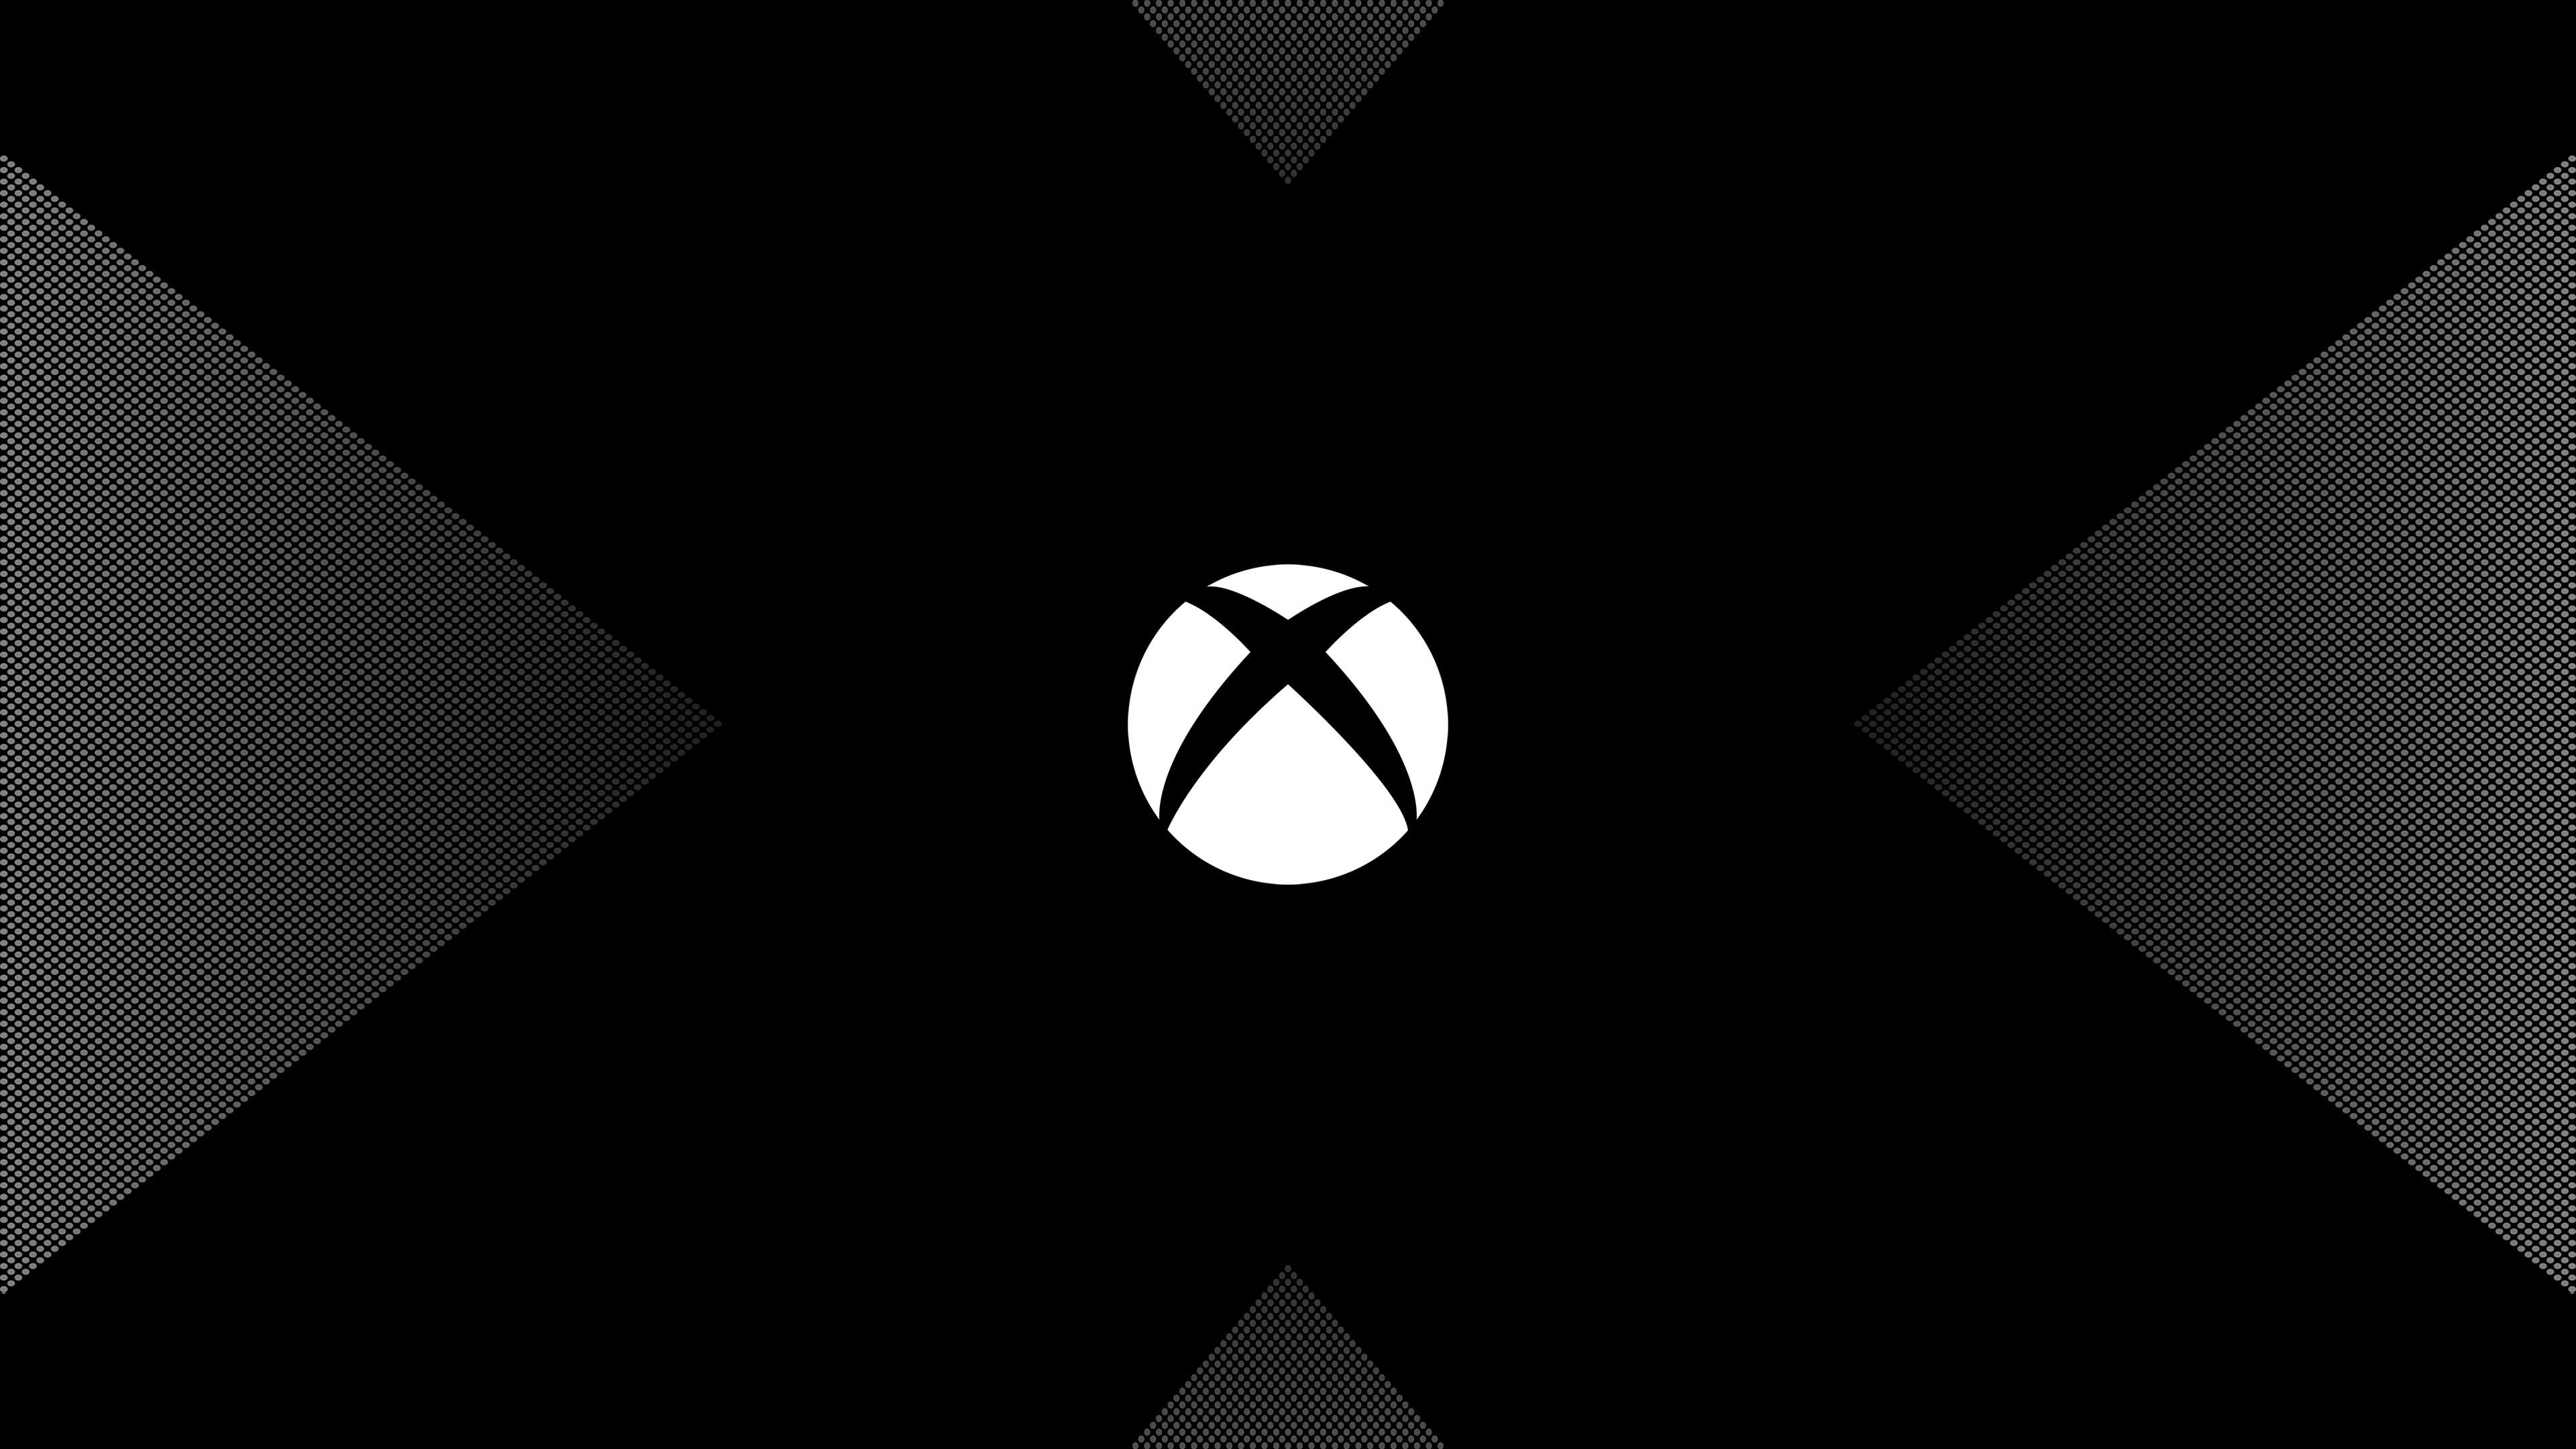 Xbox Wallpaper 17